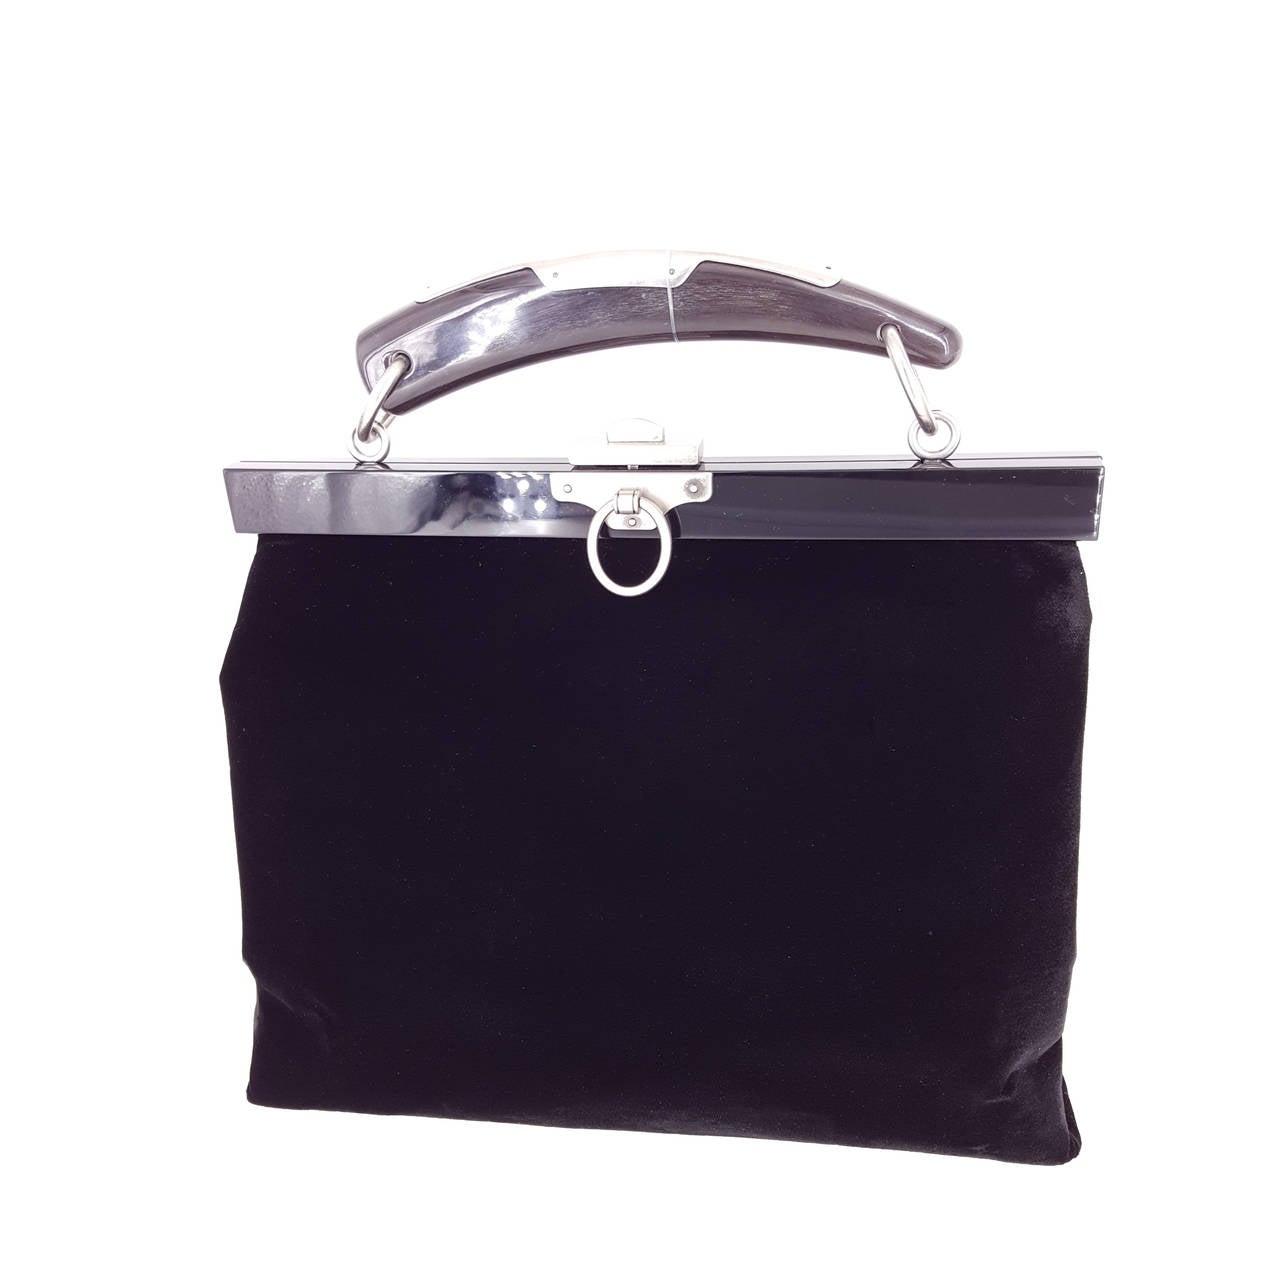 YSL Limited Edition Black Velvet Mombasa Handbag With Lucite Horn Handle.